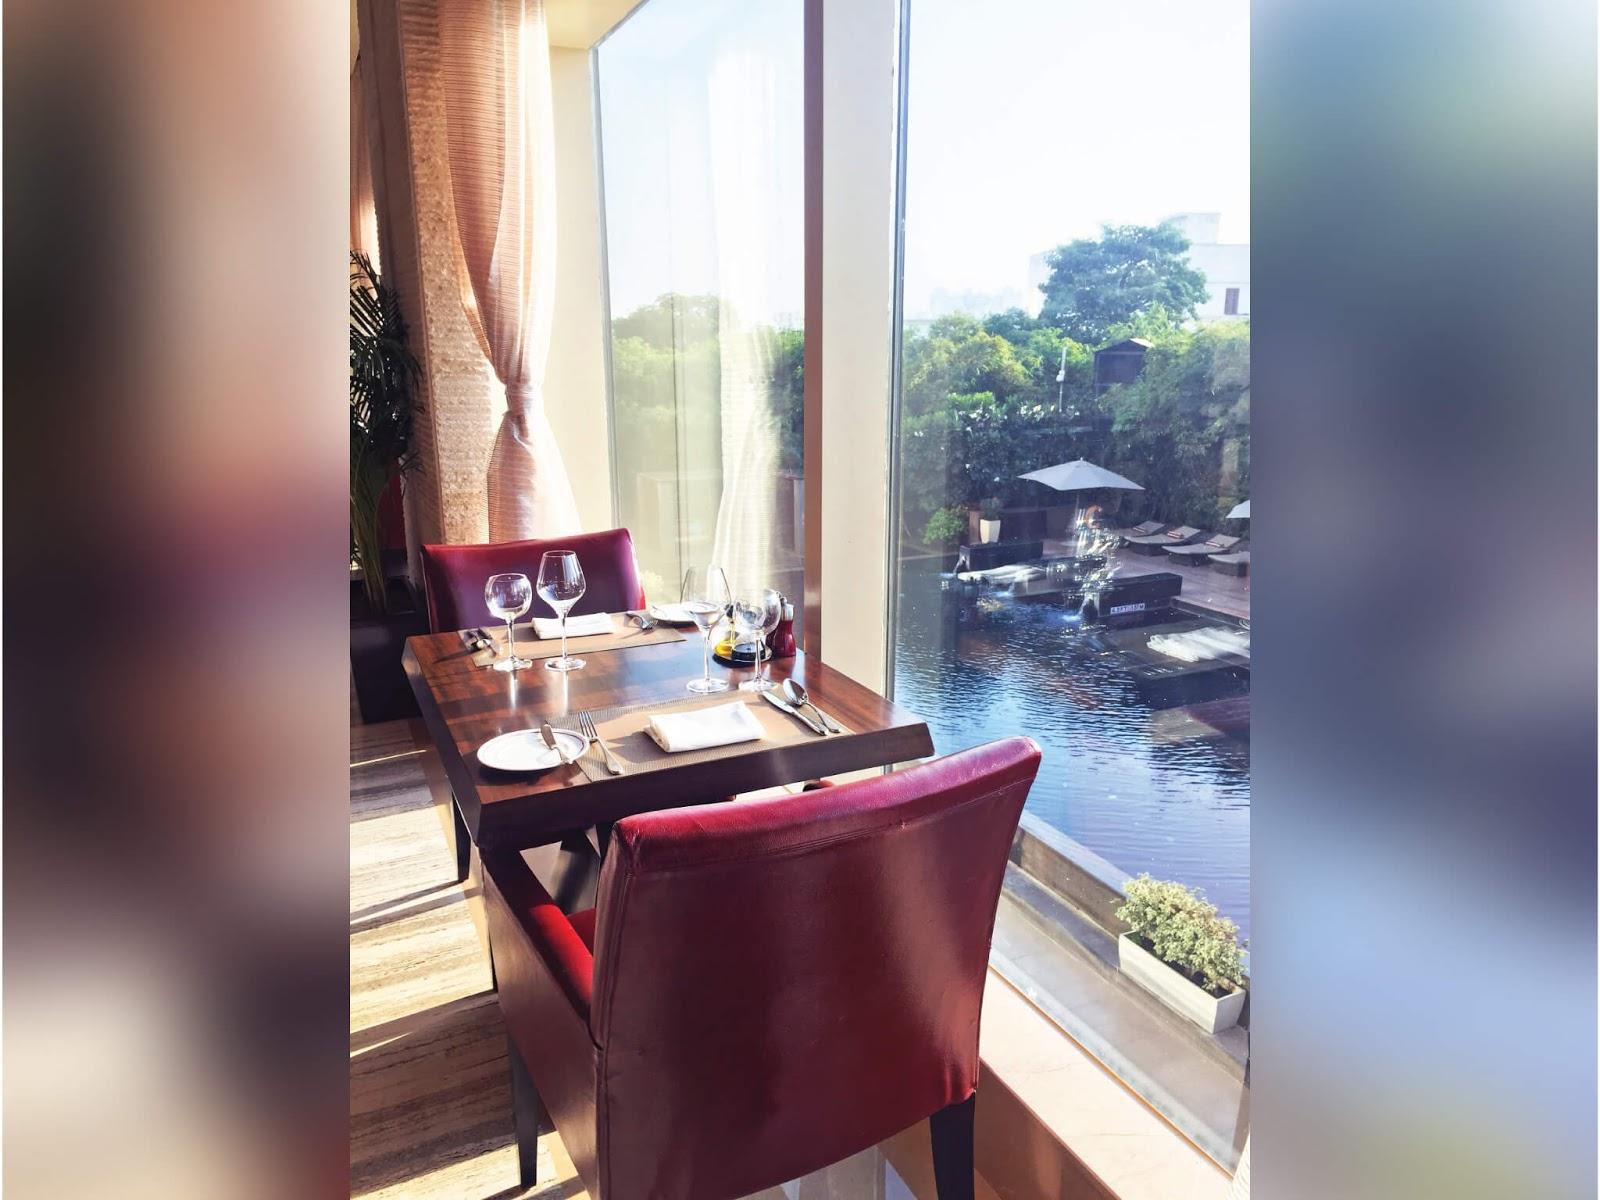 White apron gurgaon - Indeed A Beautiful Kitchen Le Meridien Gurgaon